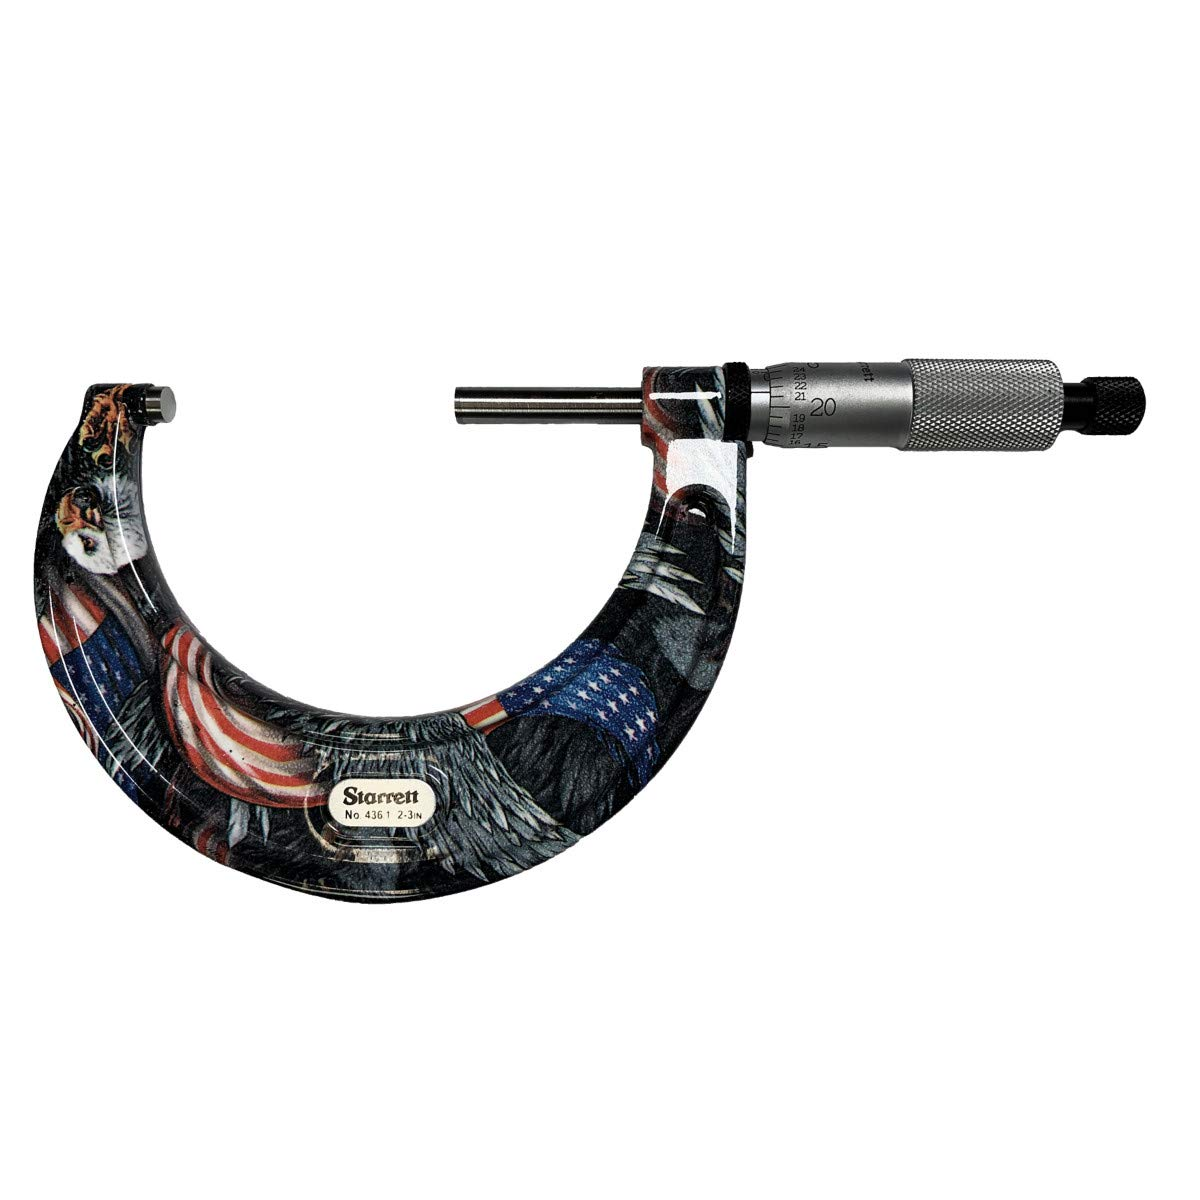 0-1 Range.0001 Carbide Anvil-Spindle Camouflage Rachet Thimble Starrett CFT436.1XRL-1 Outside Micrometer